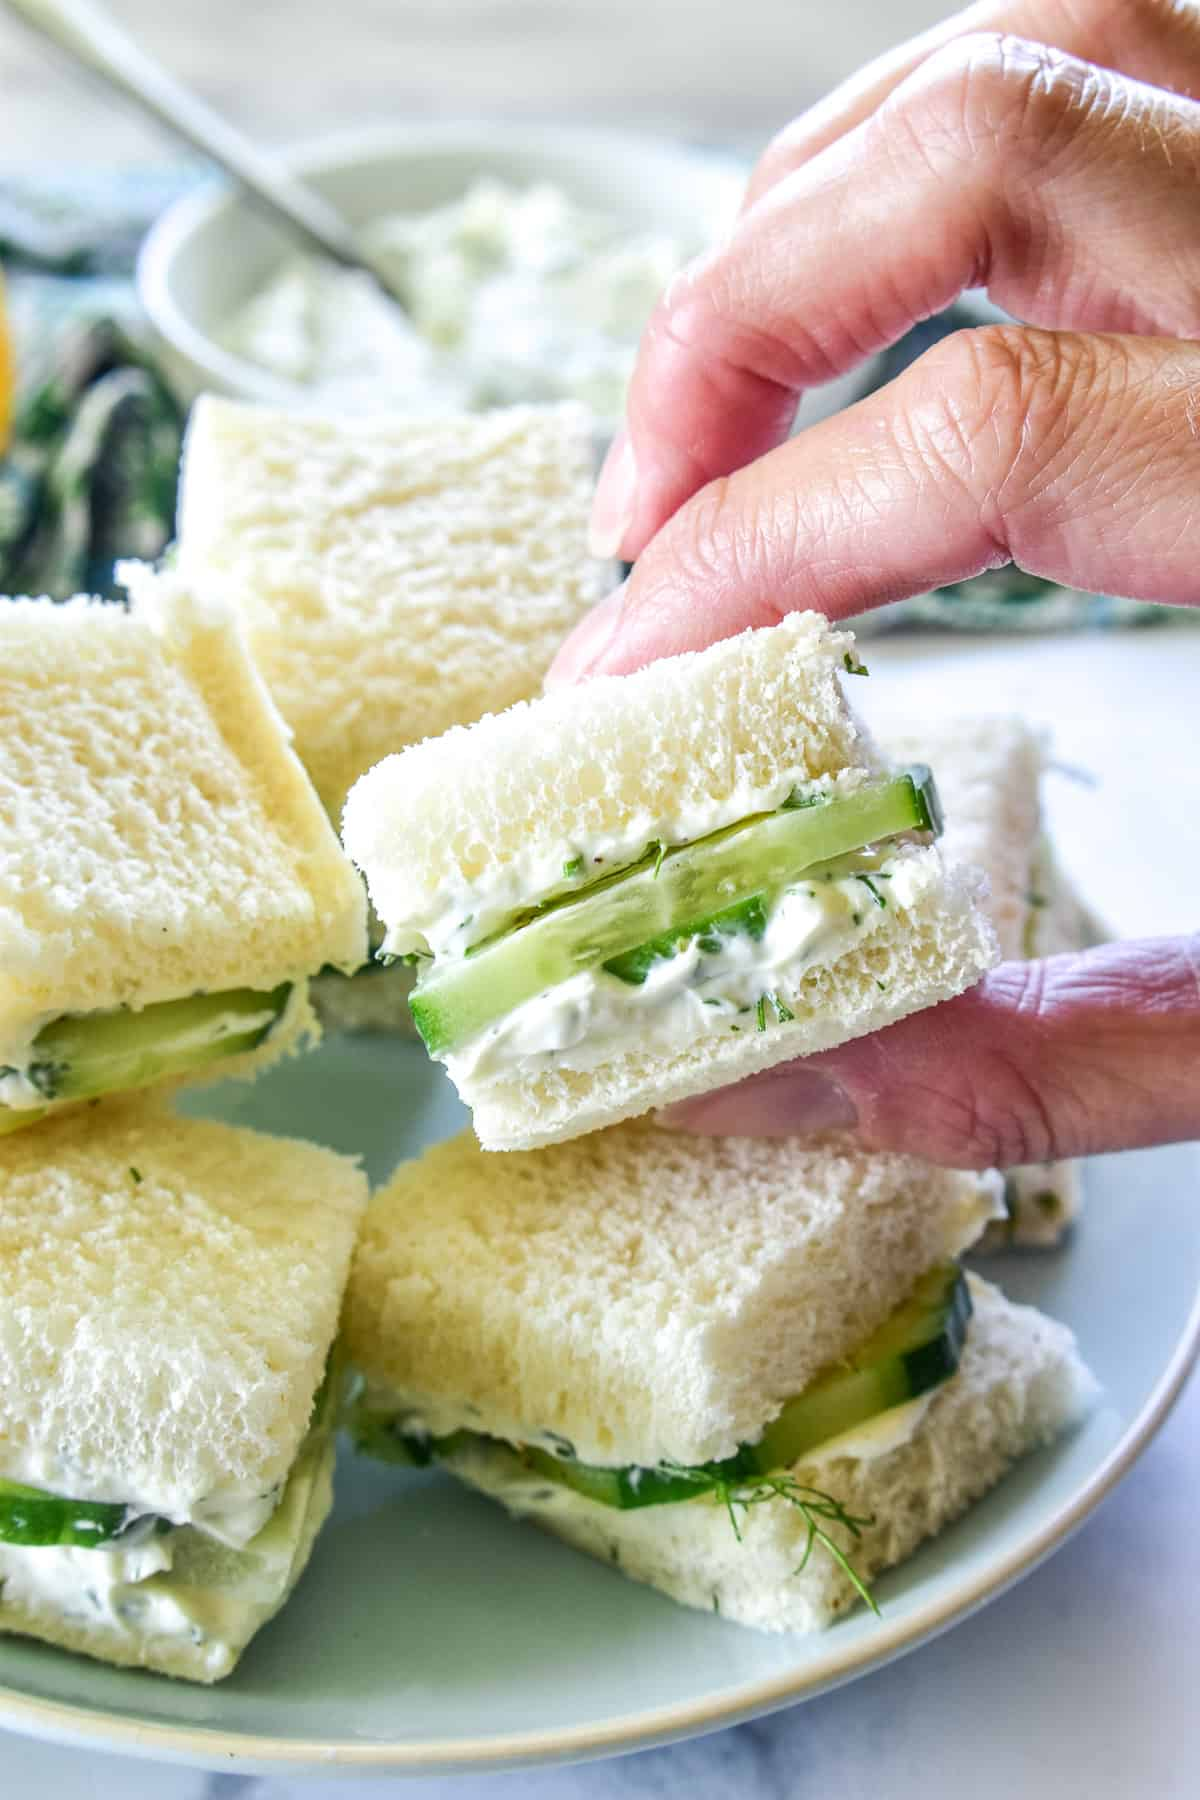 Hand grabbing a Cucumber Sandwich square